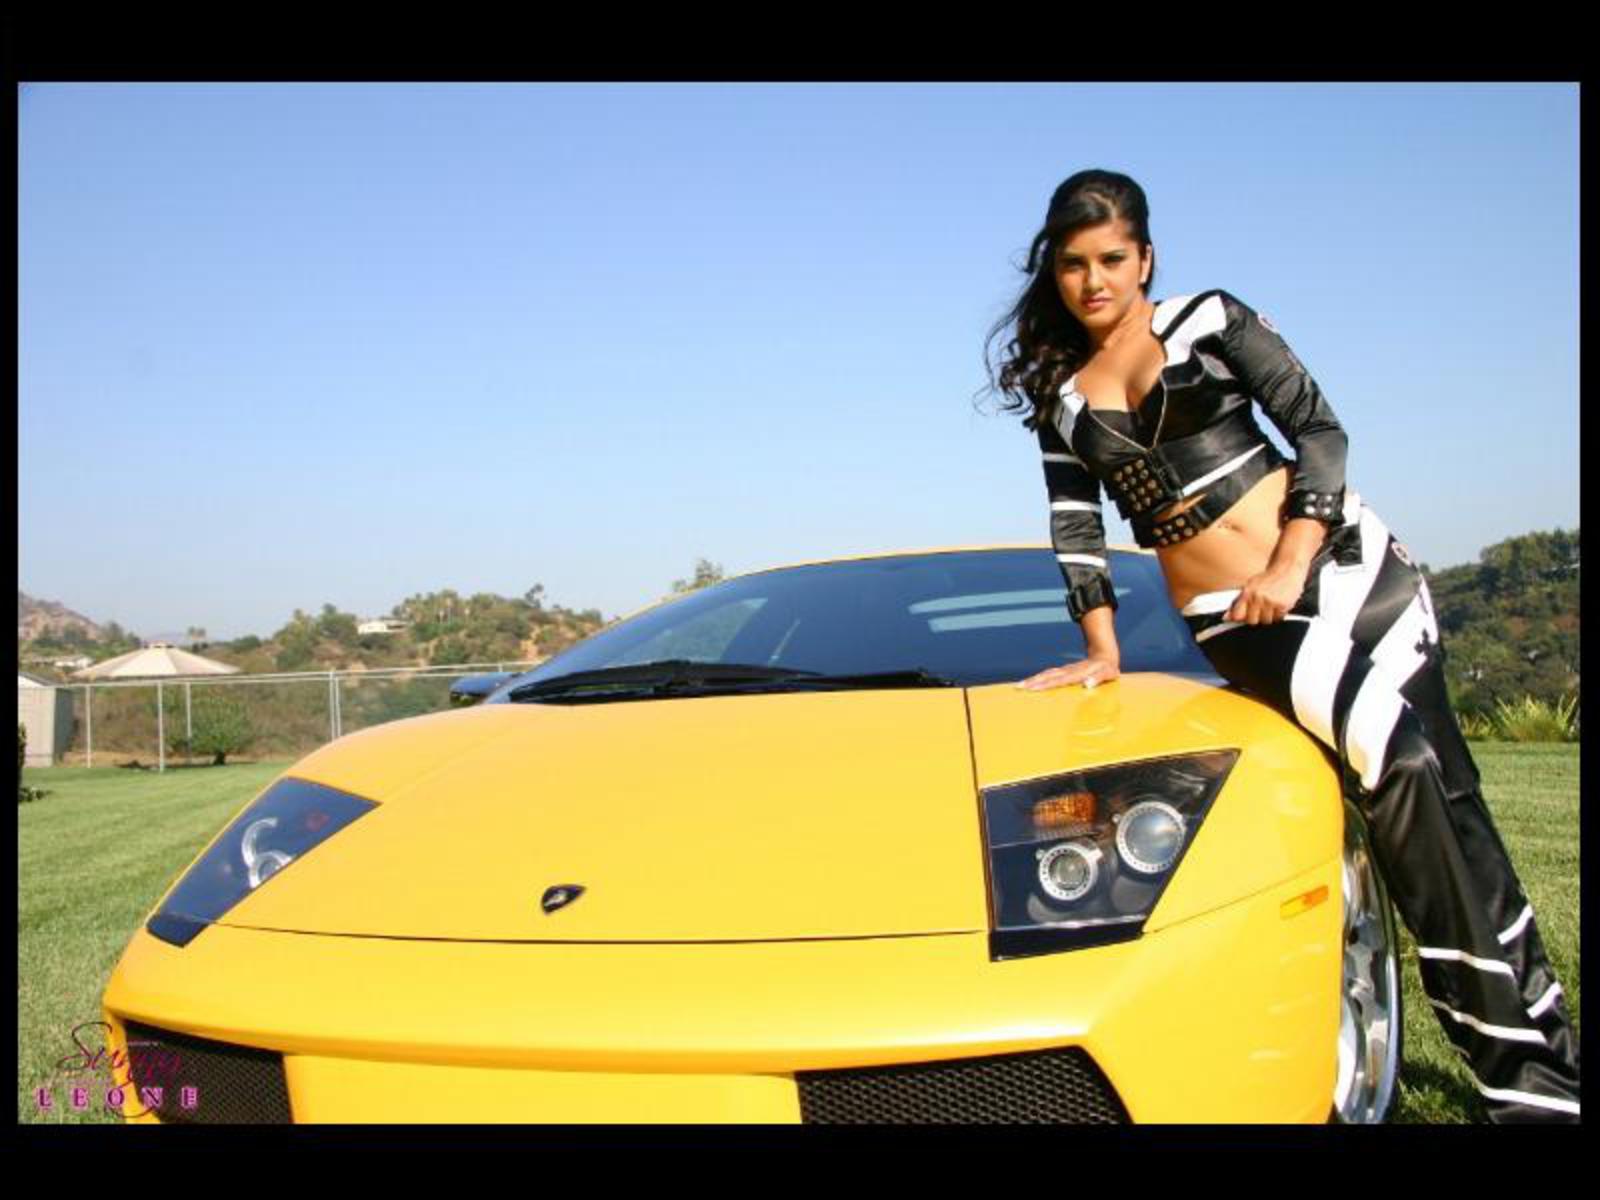 http://2.bp.blogspot.com/-_W6mBn685nM/TlPBkDreQII/AAAAAAAABe8/594TNClYY2k/s1600/Sunny-Leone35.jpg